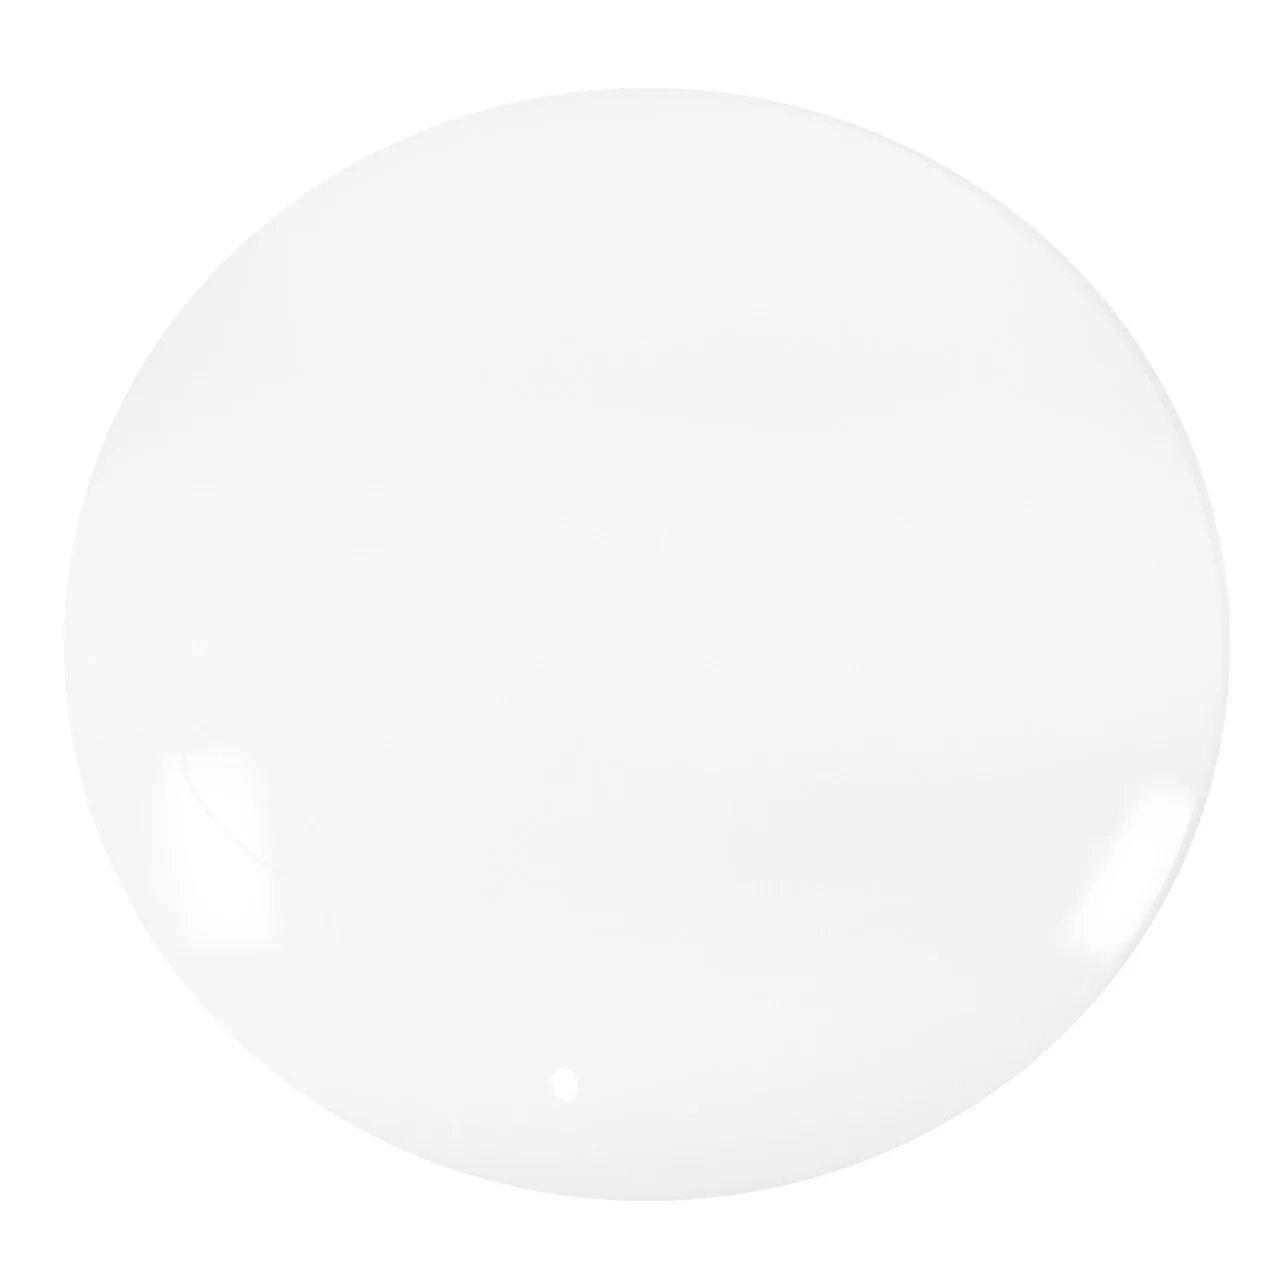 Потолочный смарт-светильник Yeelight LED Ceiling Lamp 450mm YLXD04YL White (3626-11244)